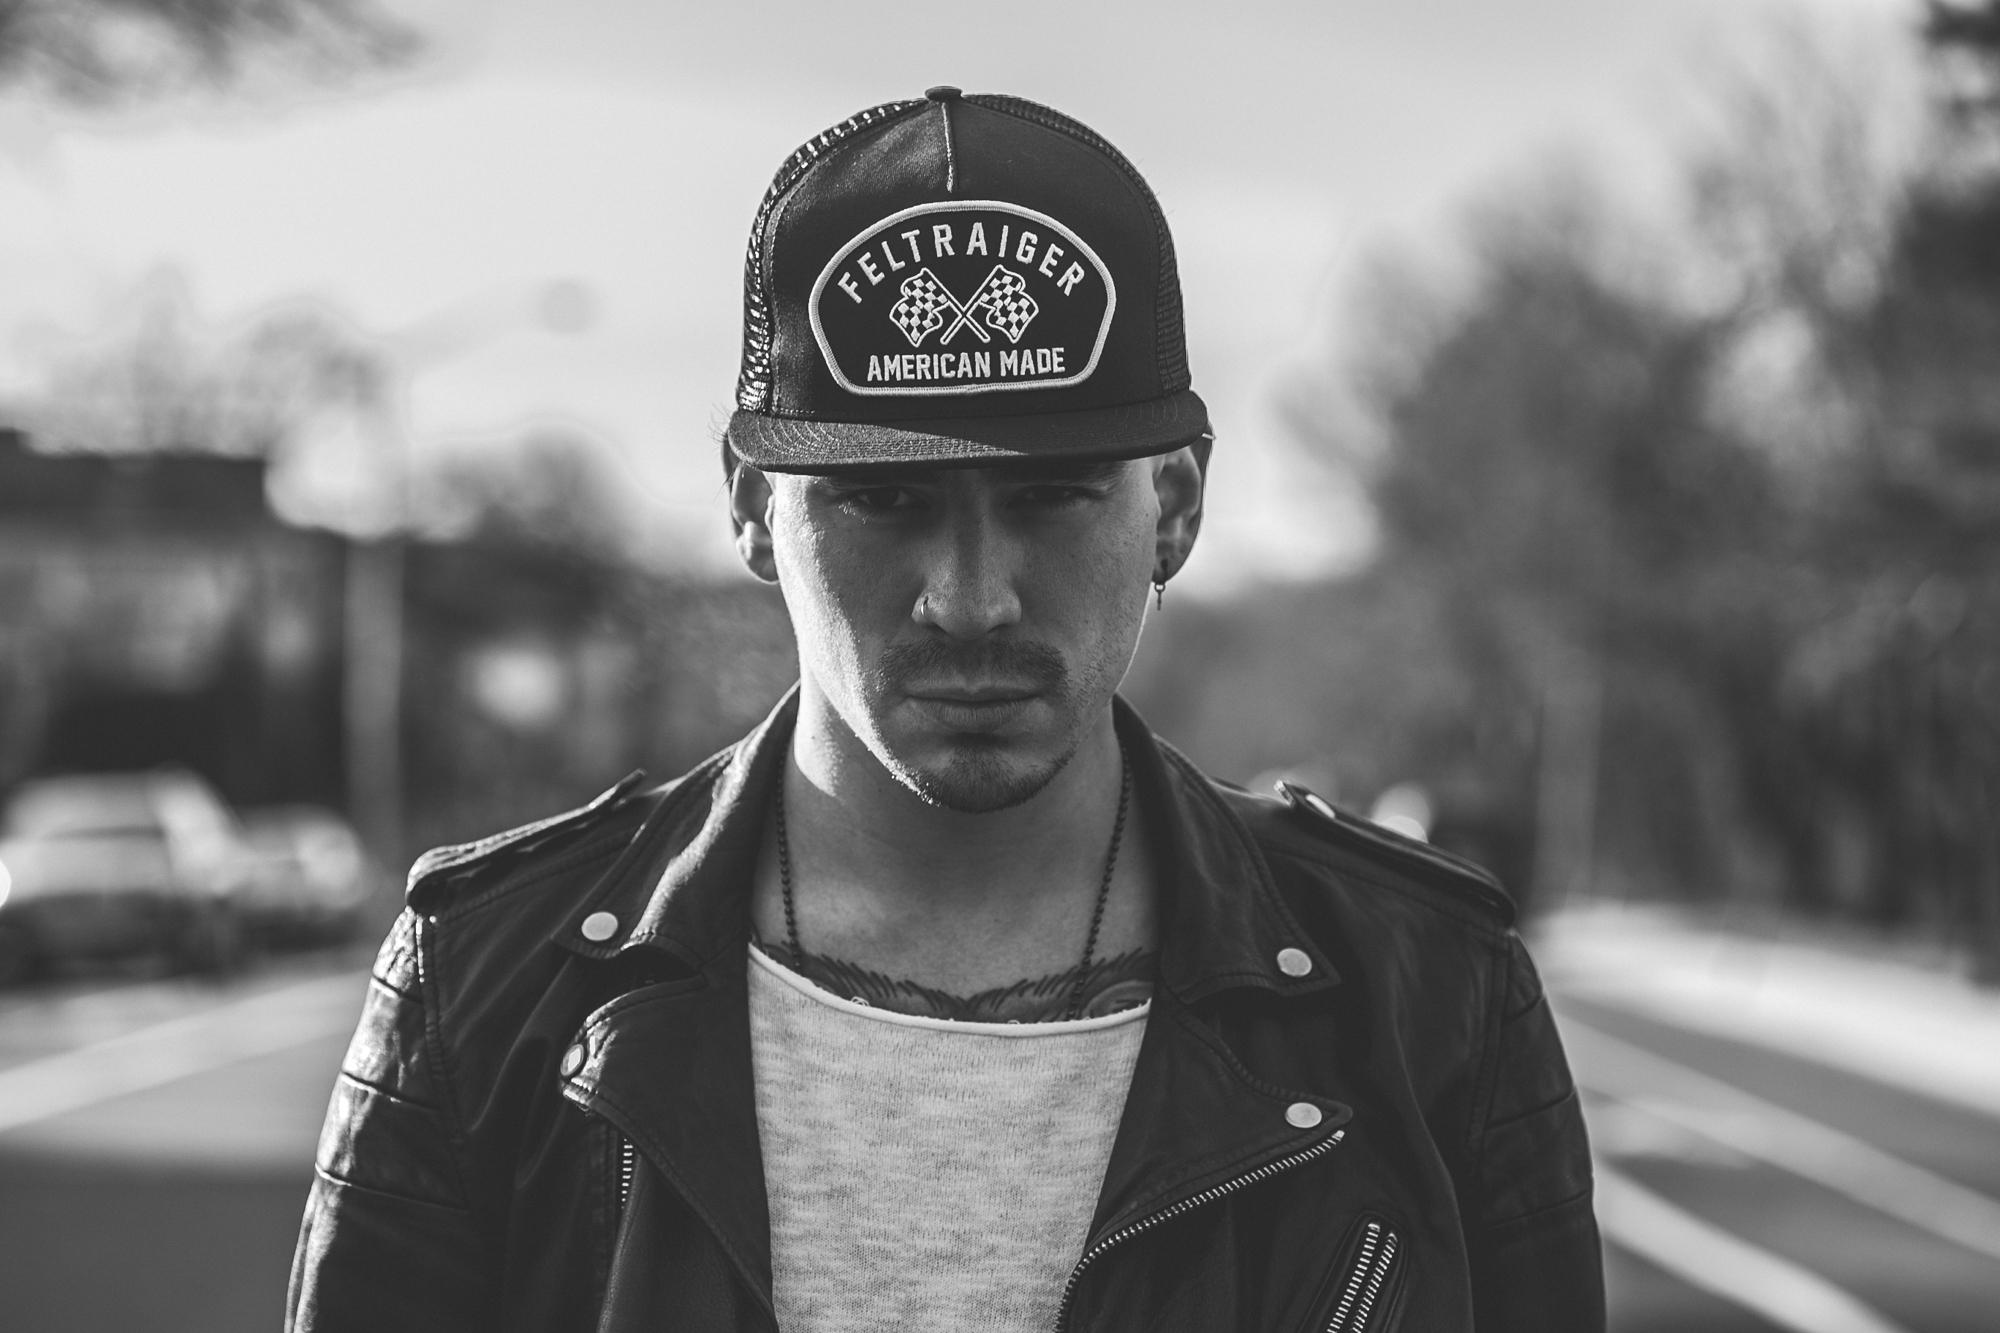 Tattoos - Leather Jacket - Cafe Racer - Feltraiger